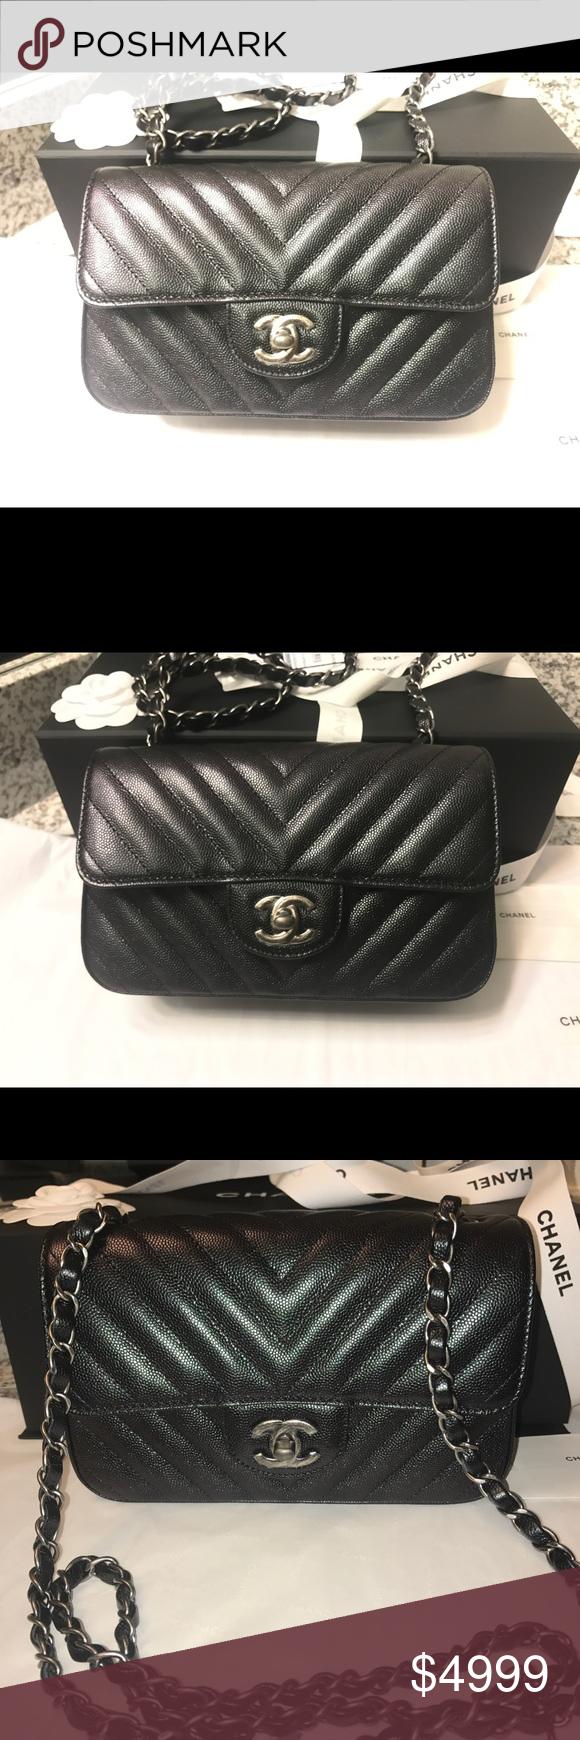 7fd4bc71179987 NEW 17B Iridescent mini flap Authentic CHANEL iridescent black caviar  leather chevron mini classic flap bag